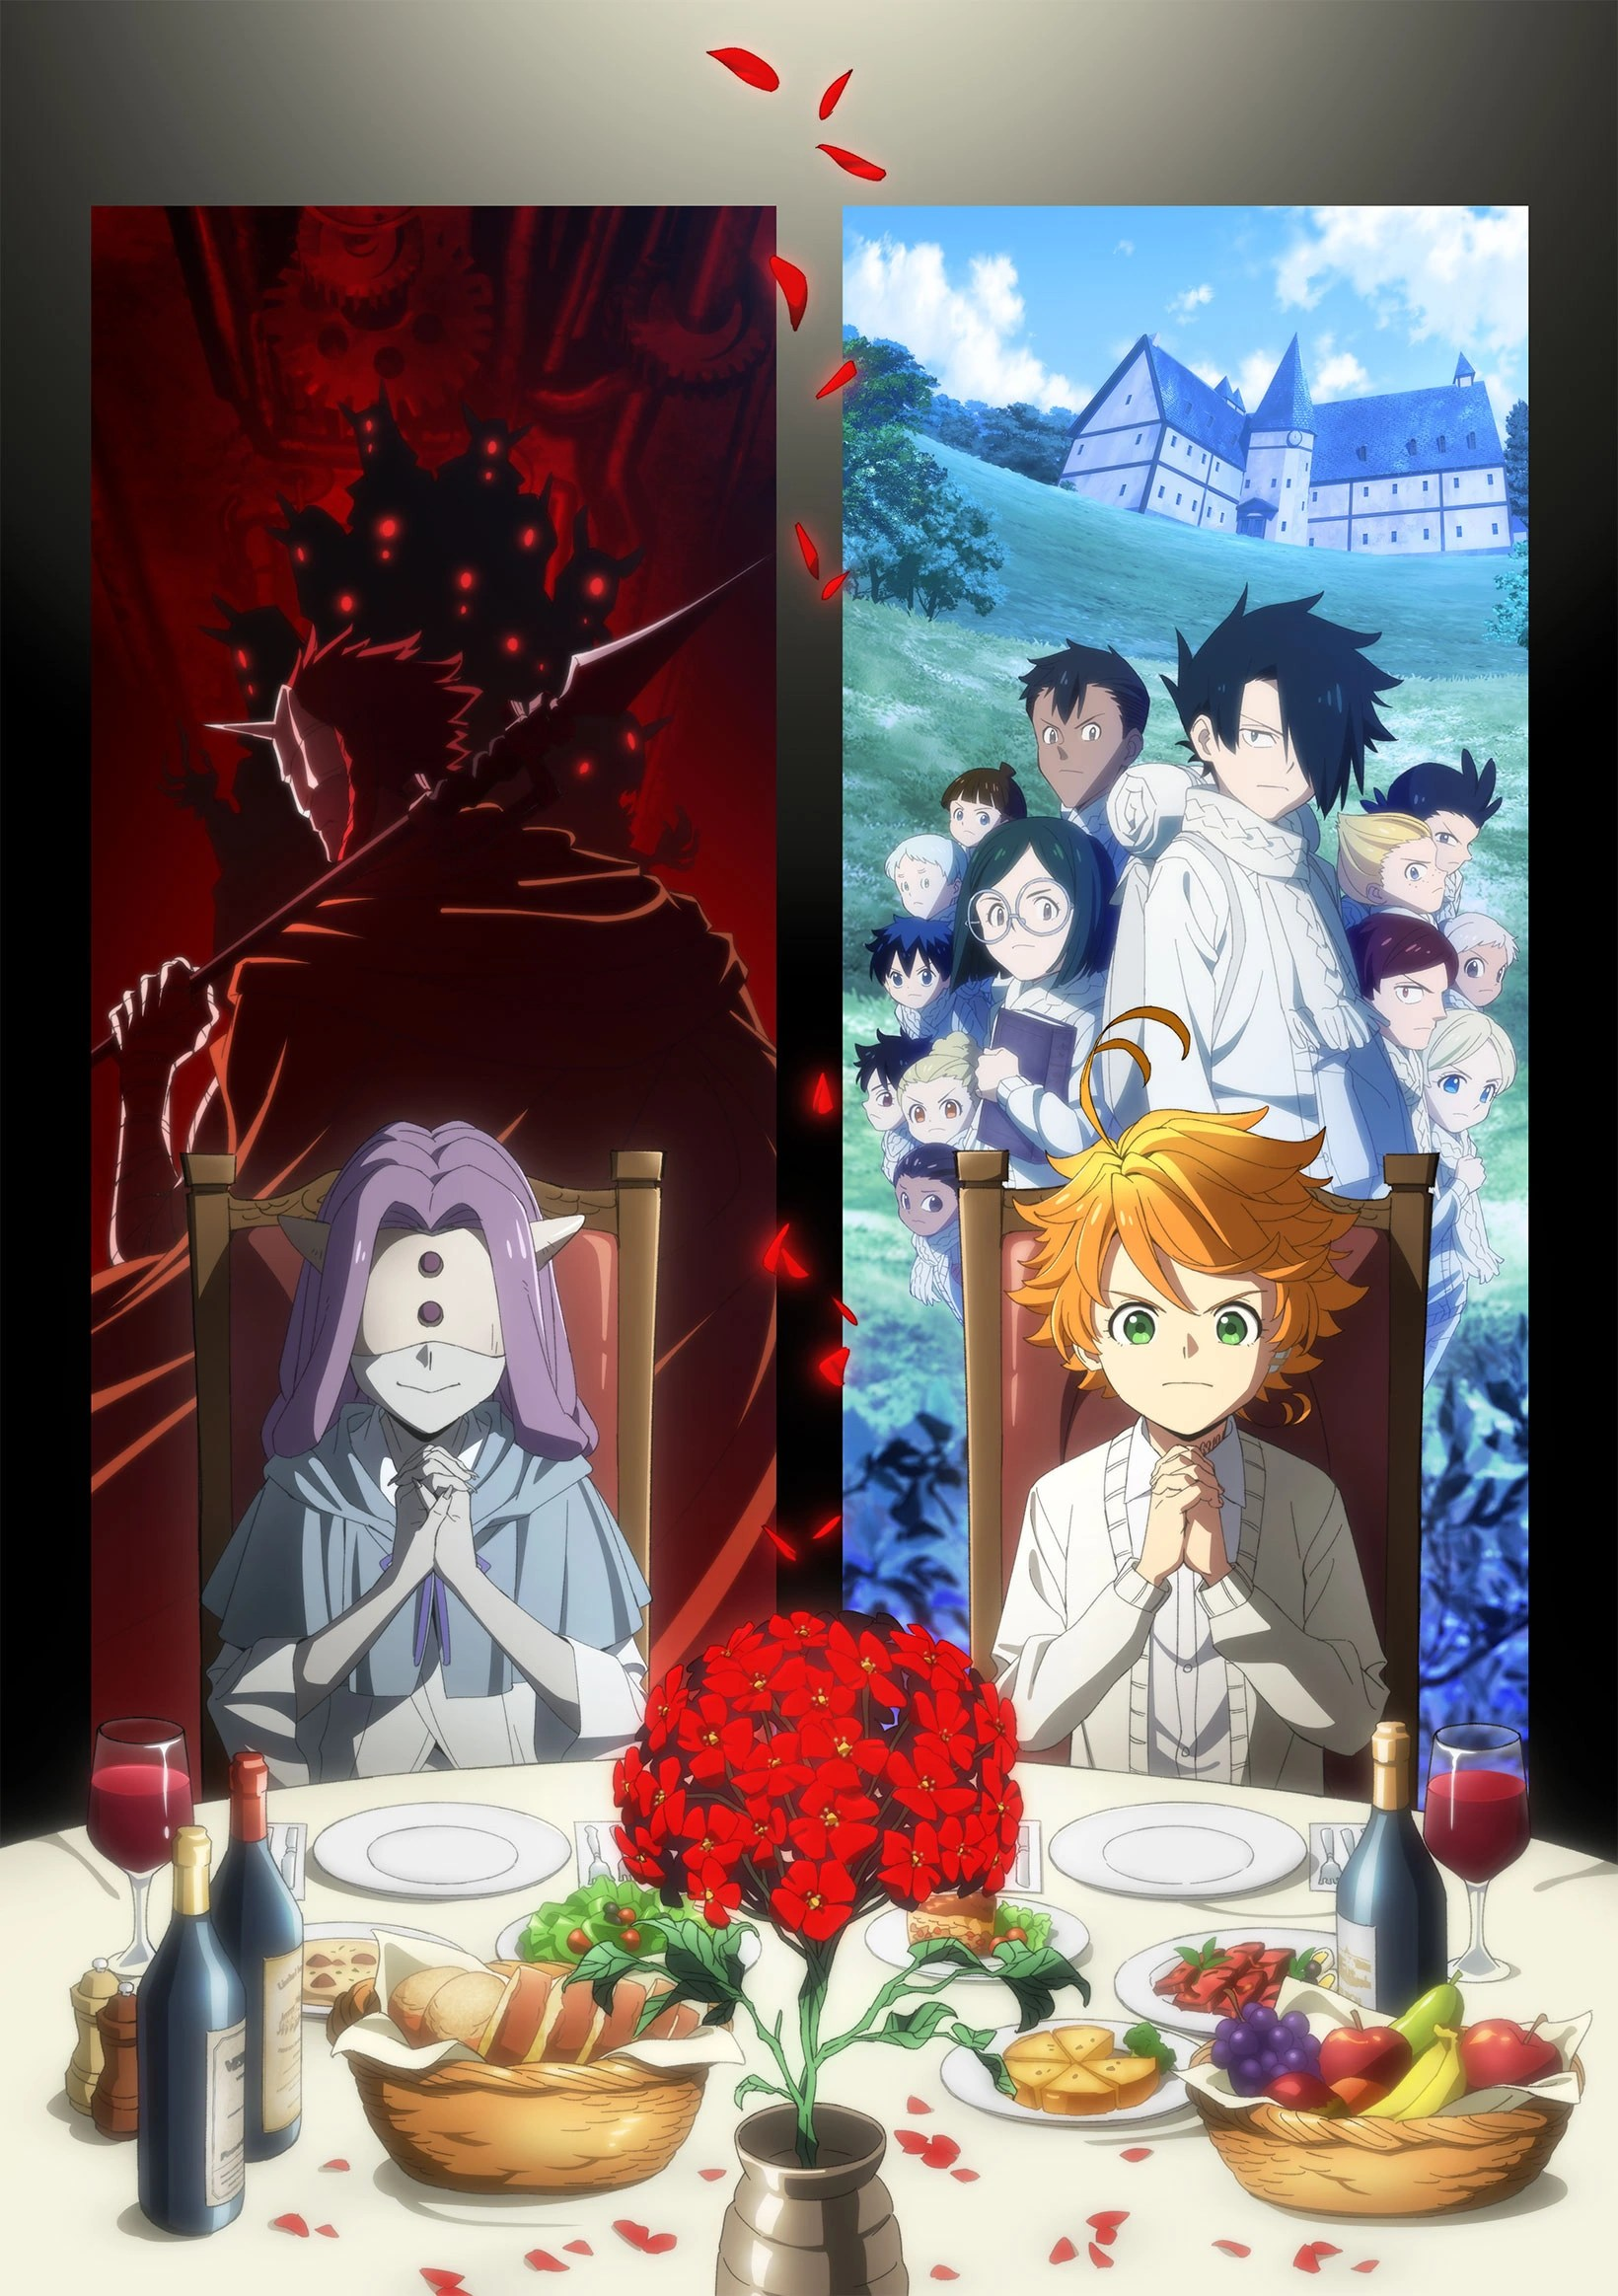 Yakusoku No Neverland - Episode 3 Vostfr : yakusoku, neverland, episode, vostfr, Promised, Neverland, (Anime), Fandom